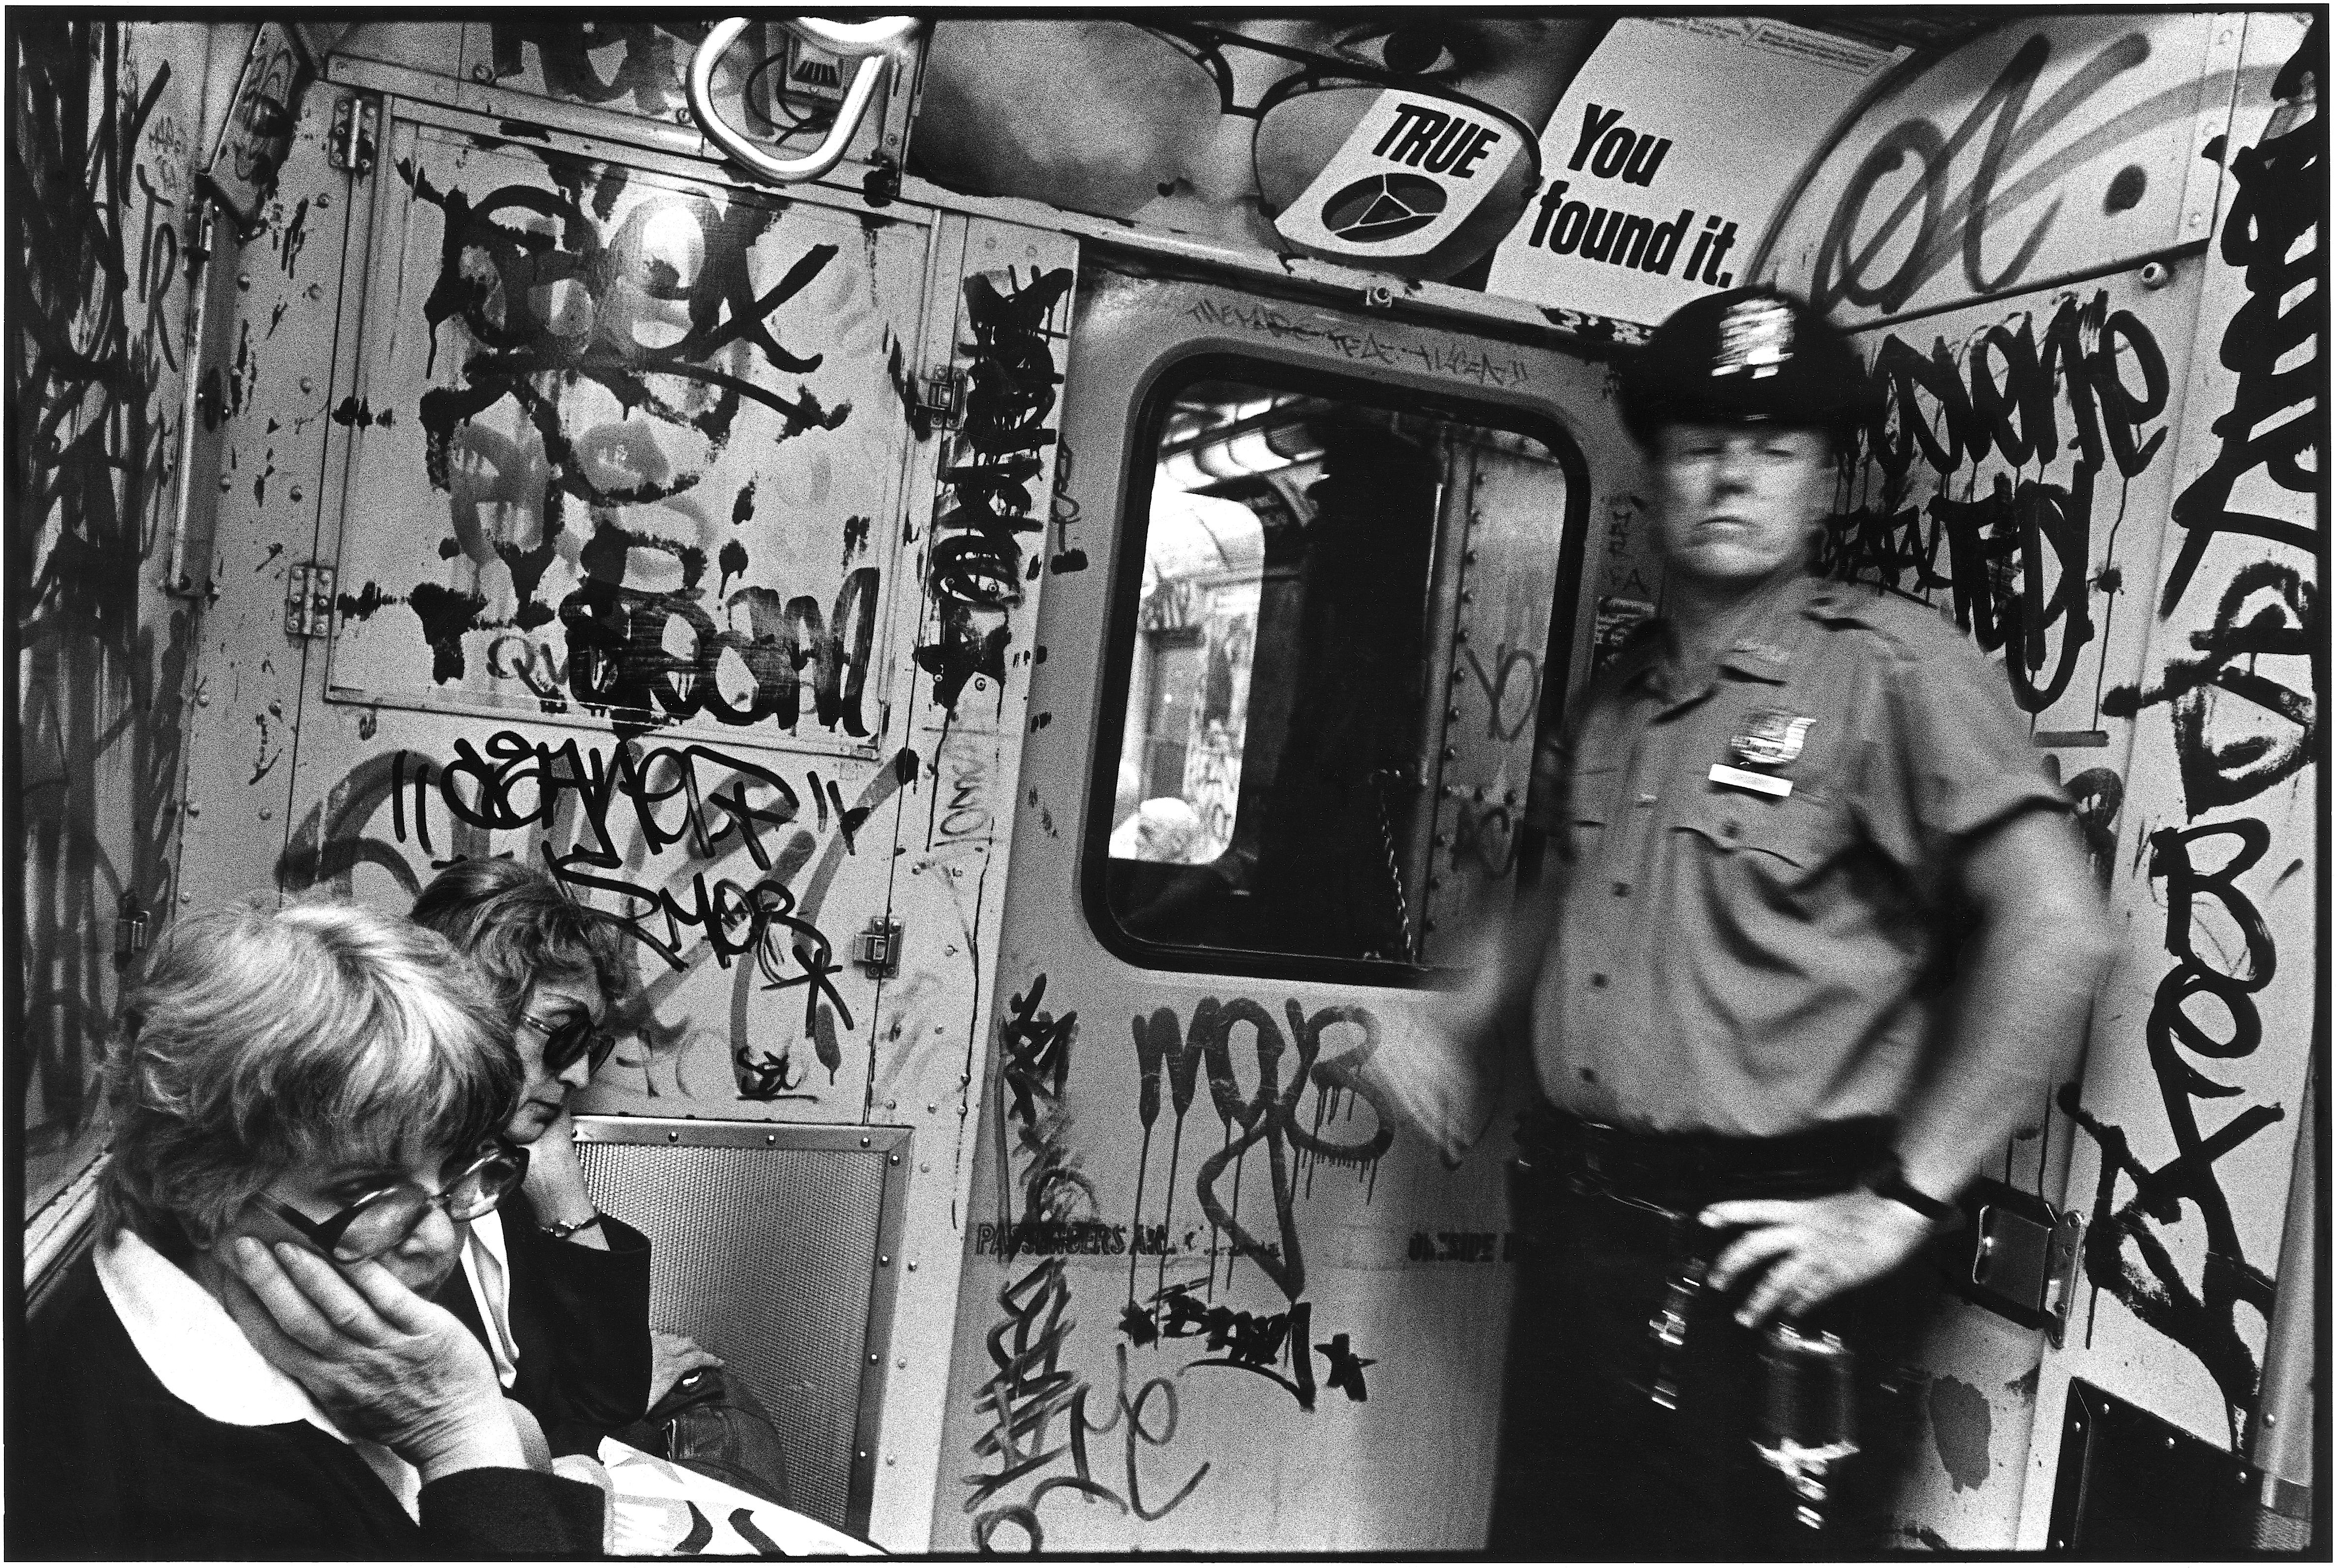 Graffiti subway, 1984 Richard Sandler Photography